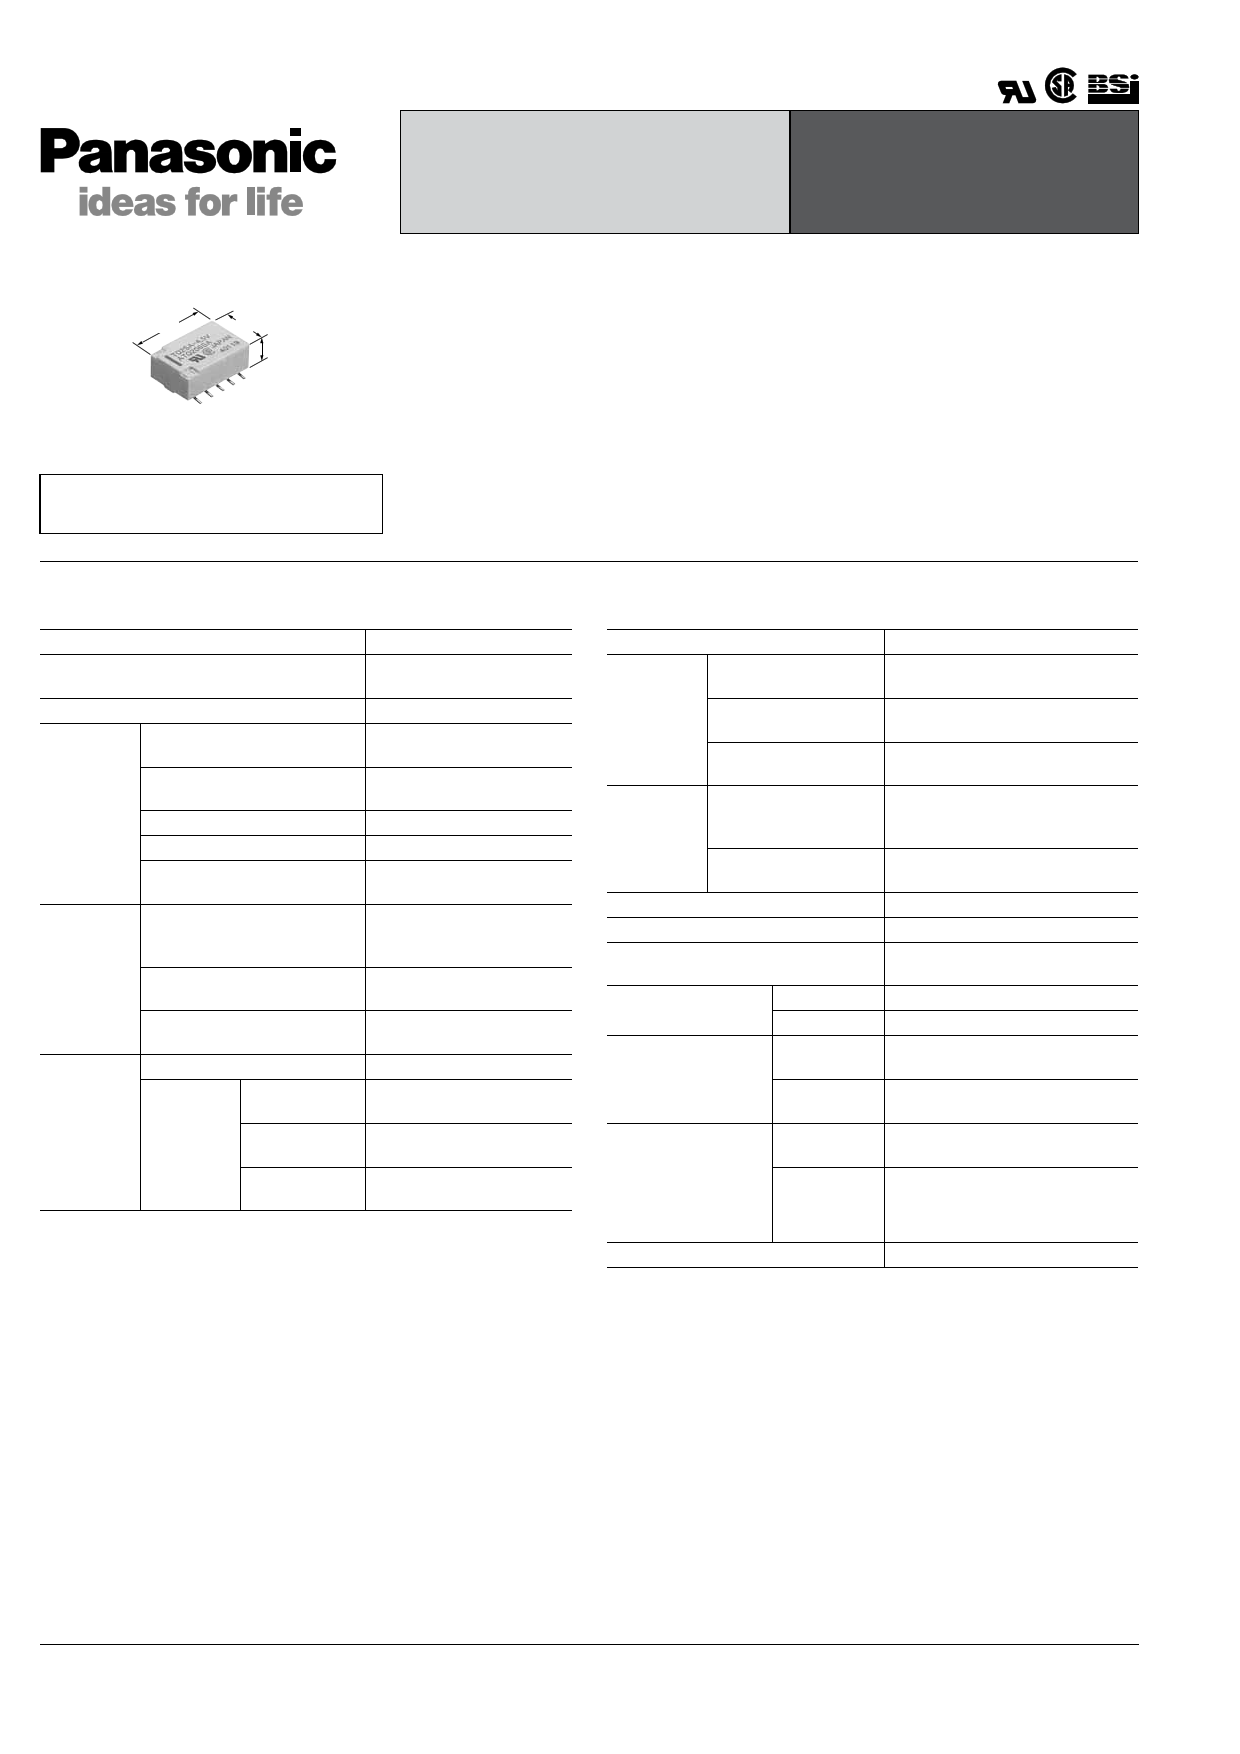 TQ2SL-L2-4.5V 데이터시트 및 TQ2SL-L2-4.5V PDF